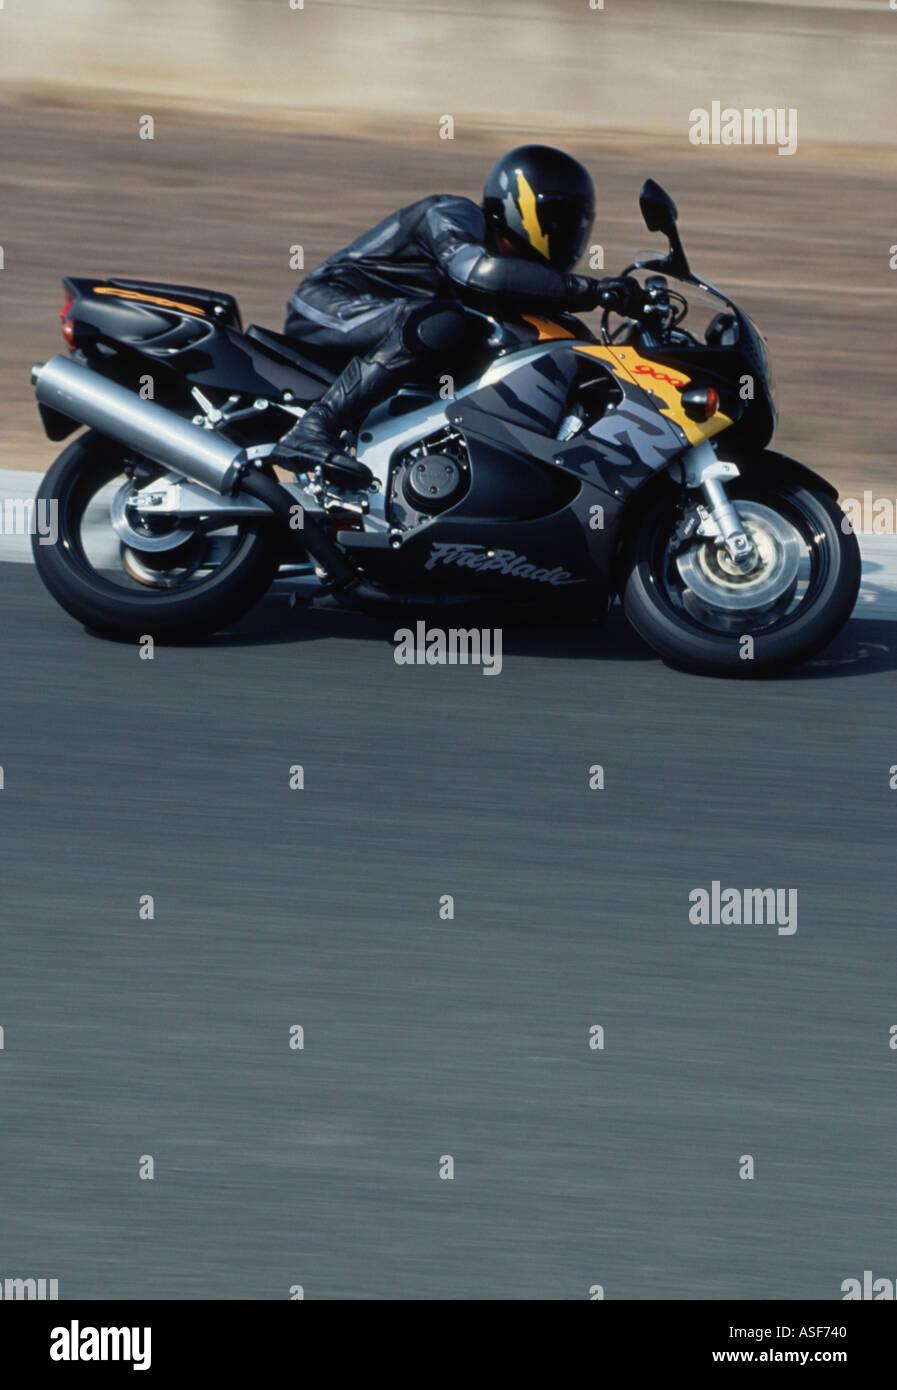 Honda 900 motor bike - Stock Image